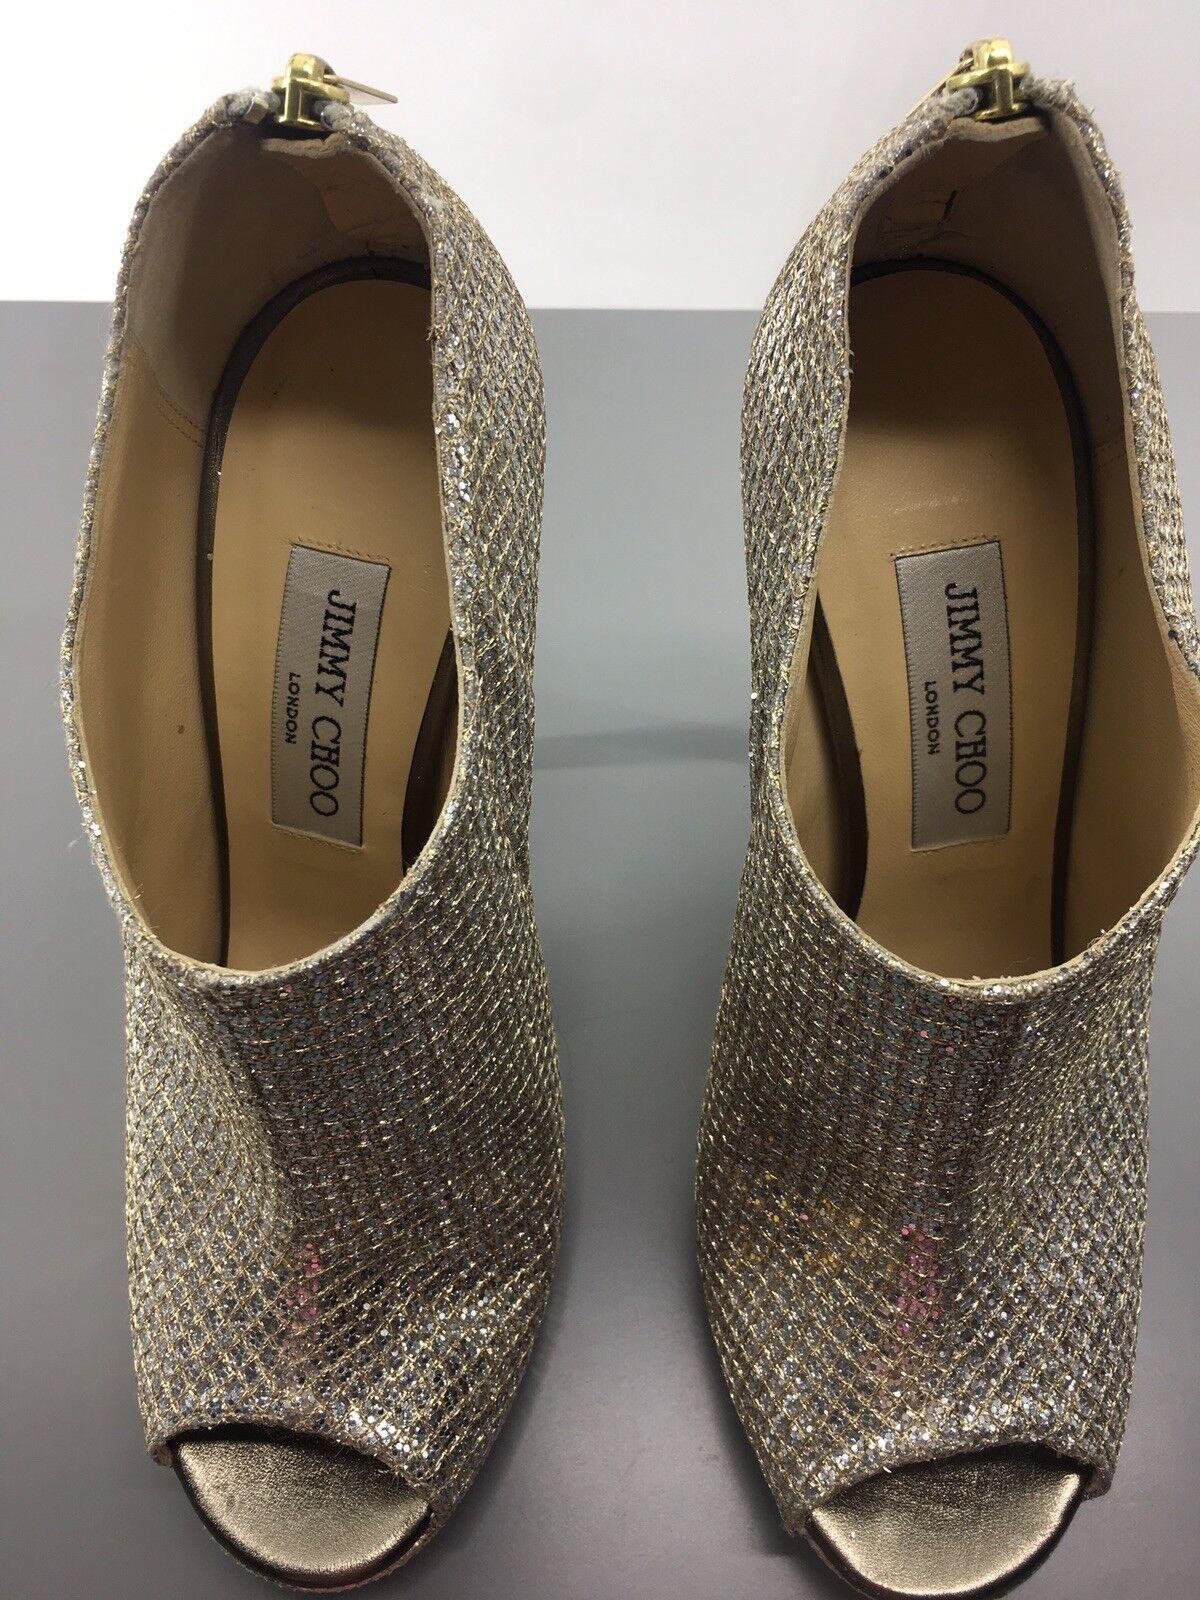 AUT Jimmy Choo Choo Choo Silver Glint Open-Toe Glitter Ankle Boots IT 39  US 8.5 EUC 69d335